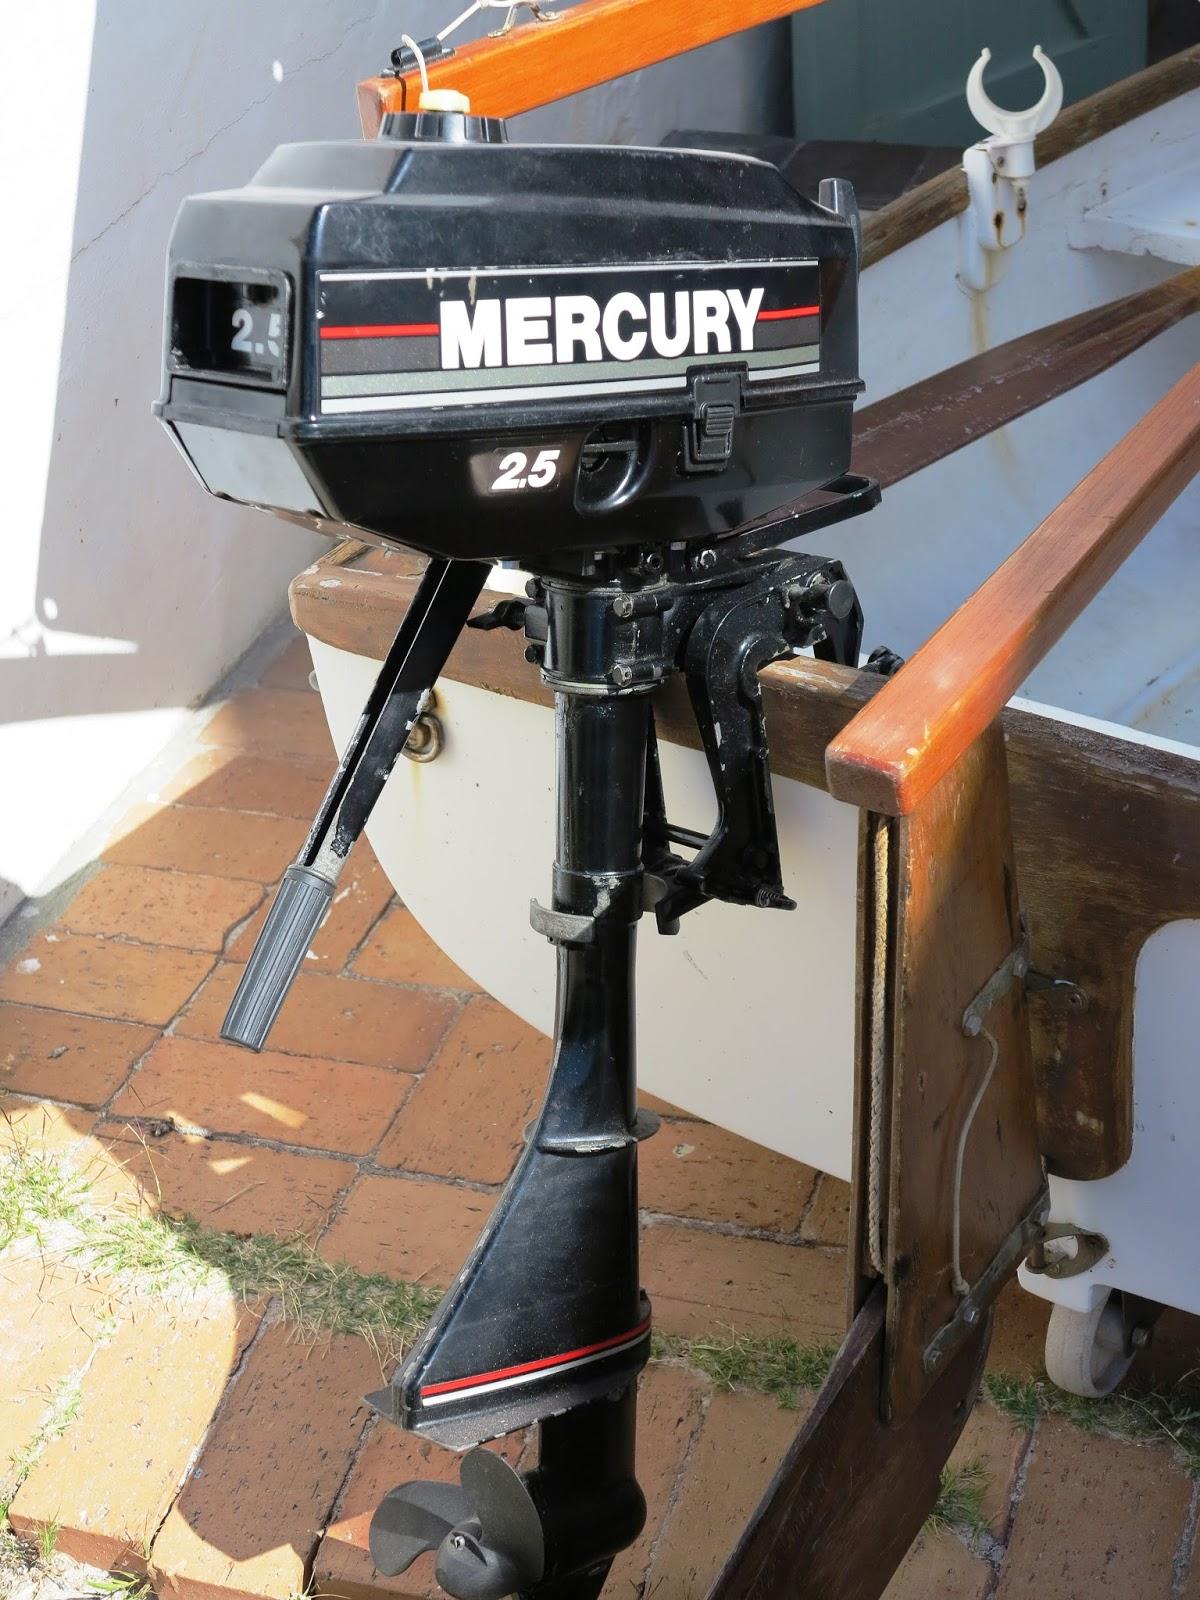 Ckd boats roy mc bride mercury outboard motor for for 5hp outboard motor for sale